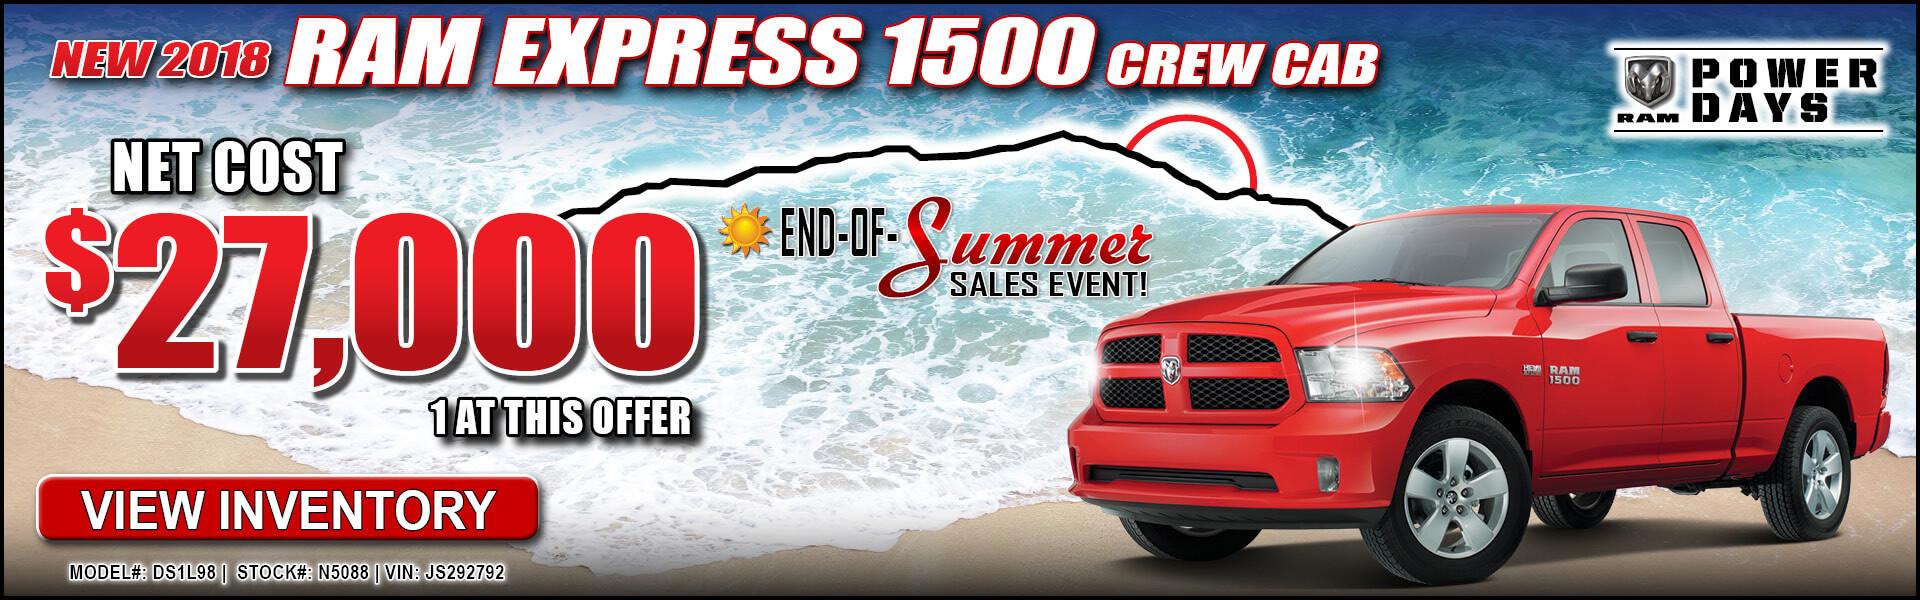 Ram 1500 Express $27,000